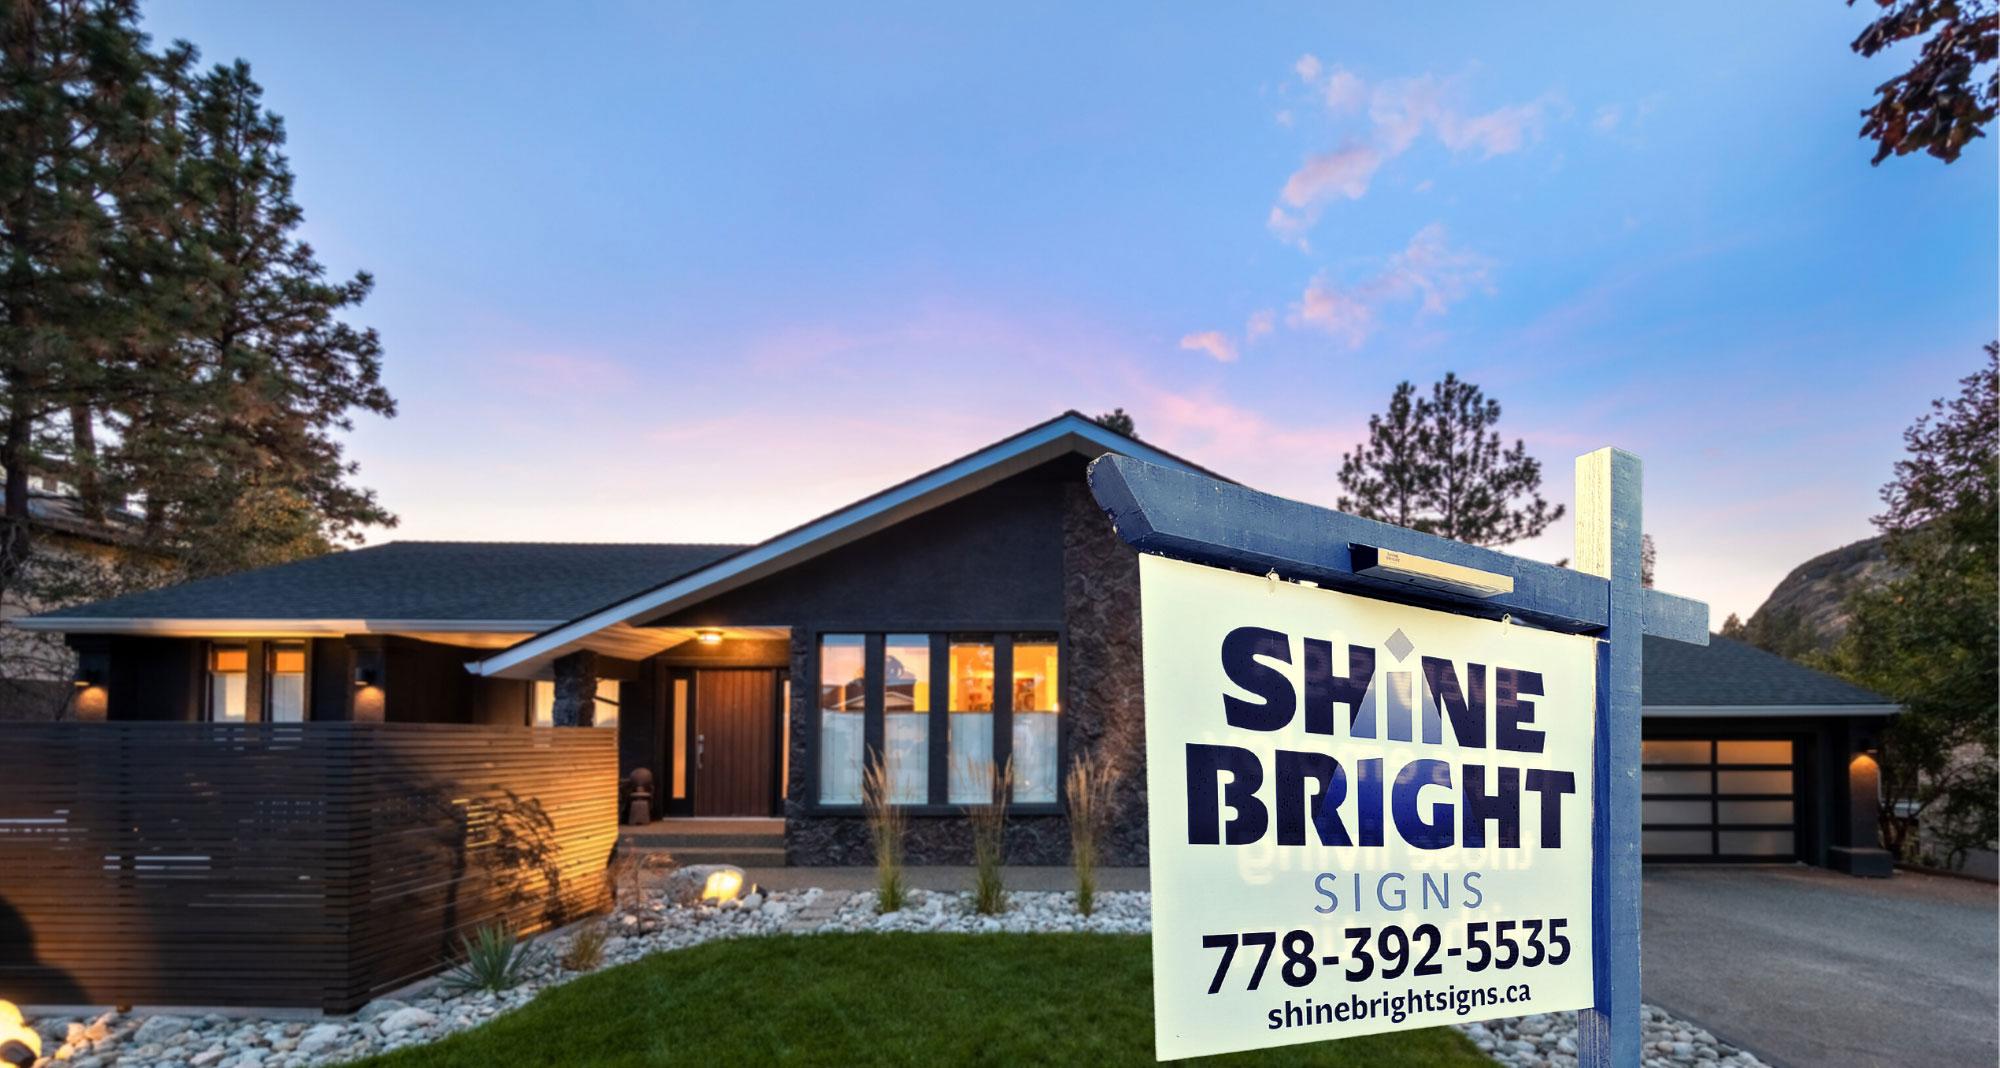 Shine Bright Signs logo